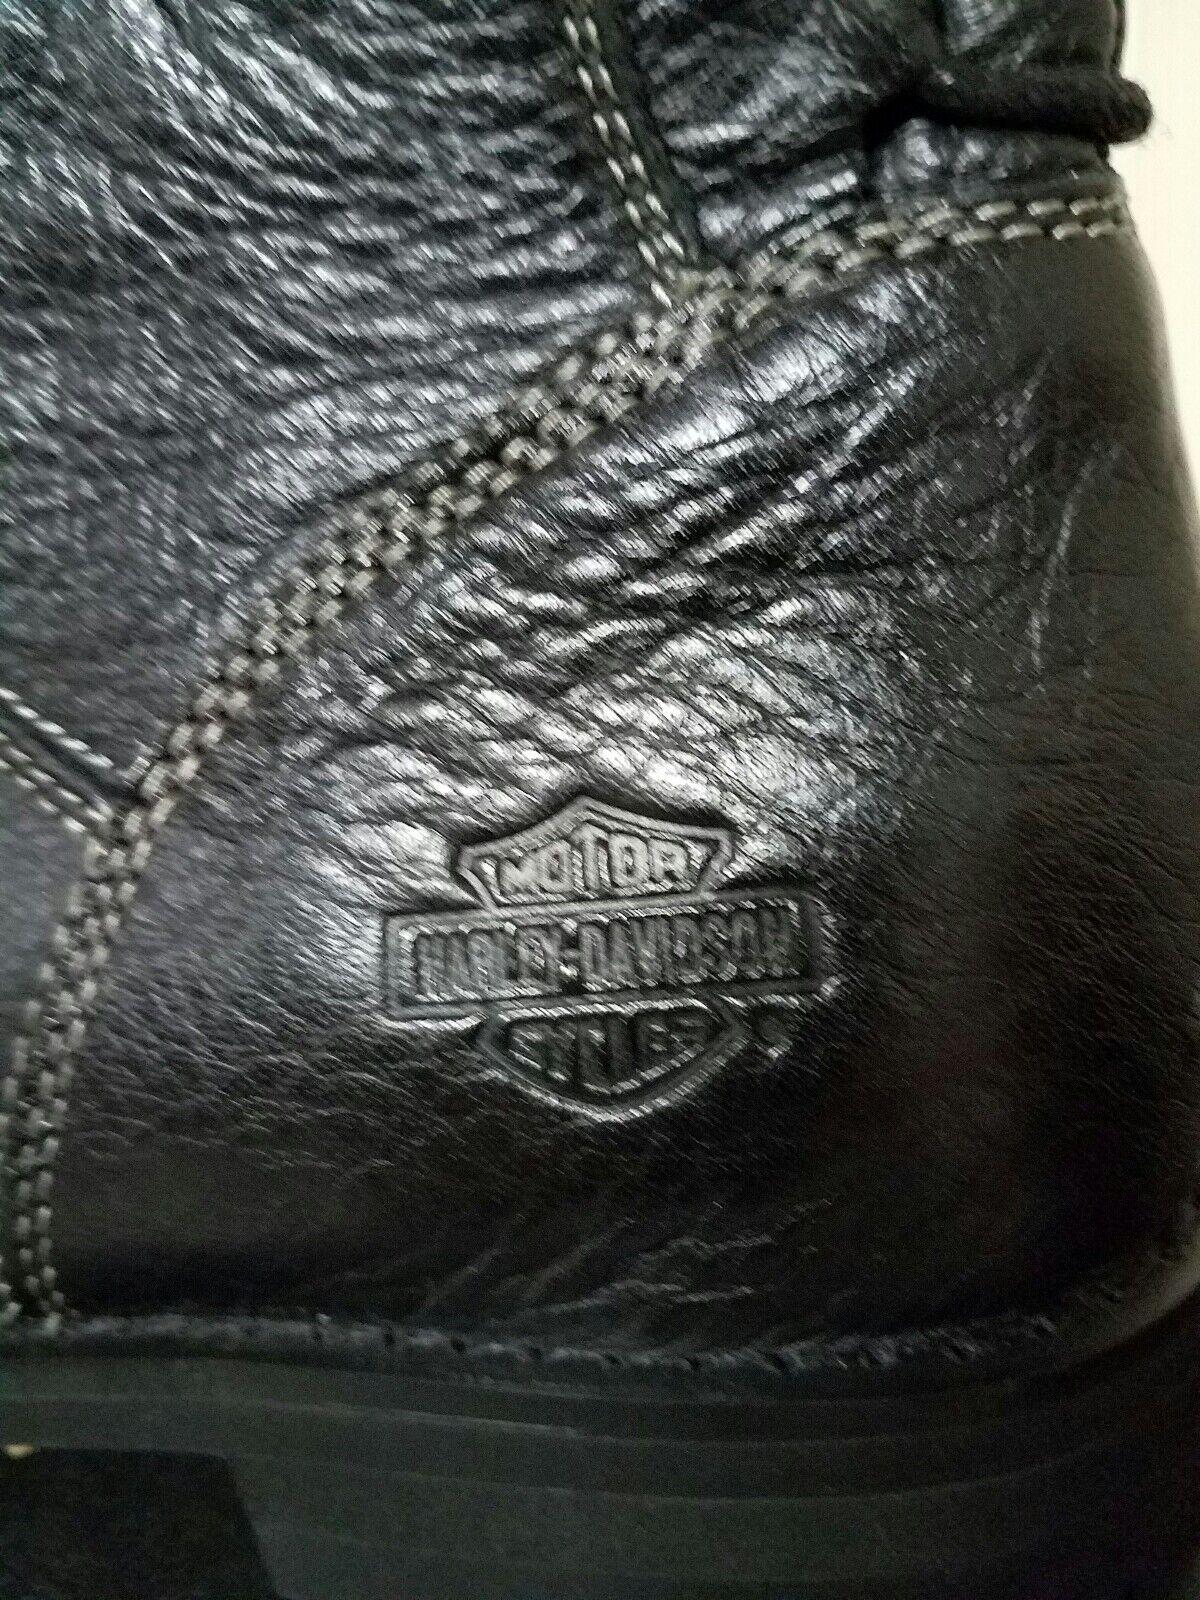 New New New Harley-Davidson femmes bottes, Taille 9.5 medium, noir,  105 bb5303